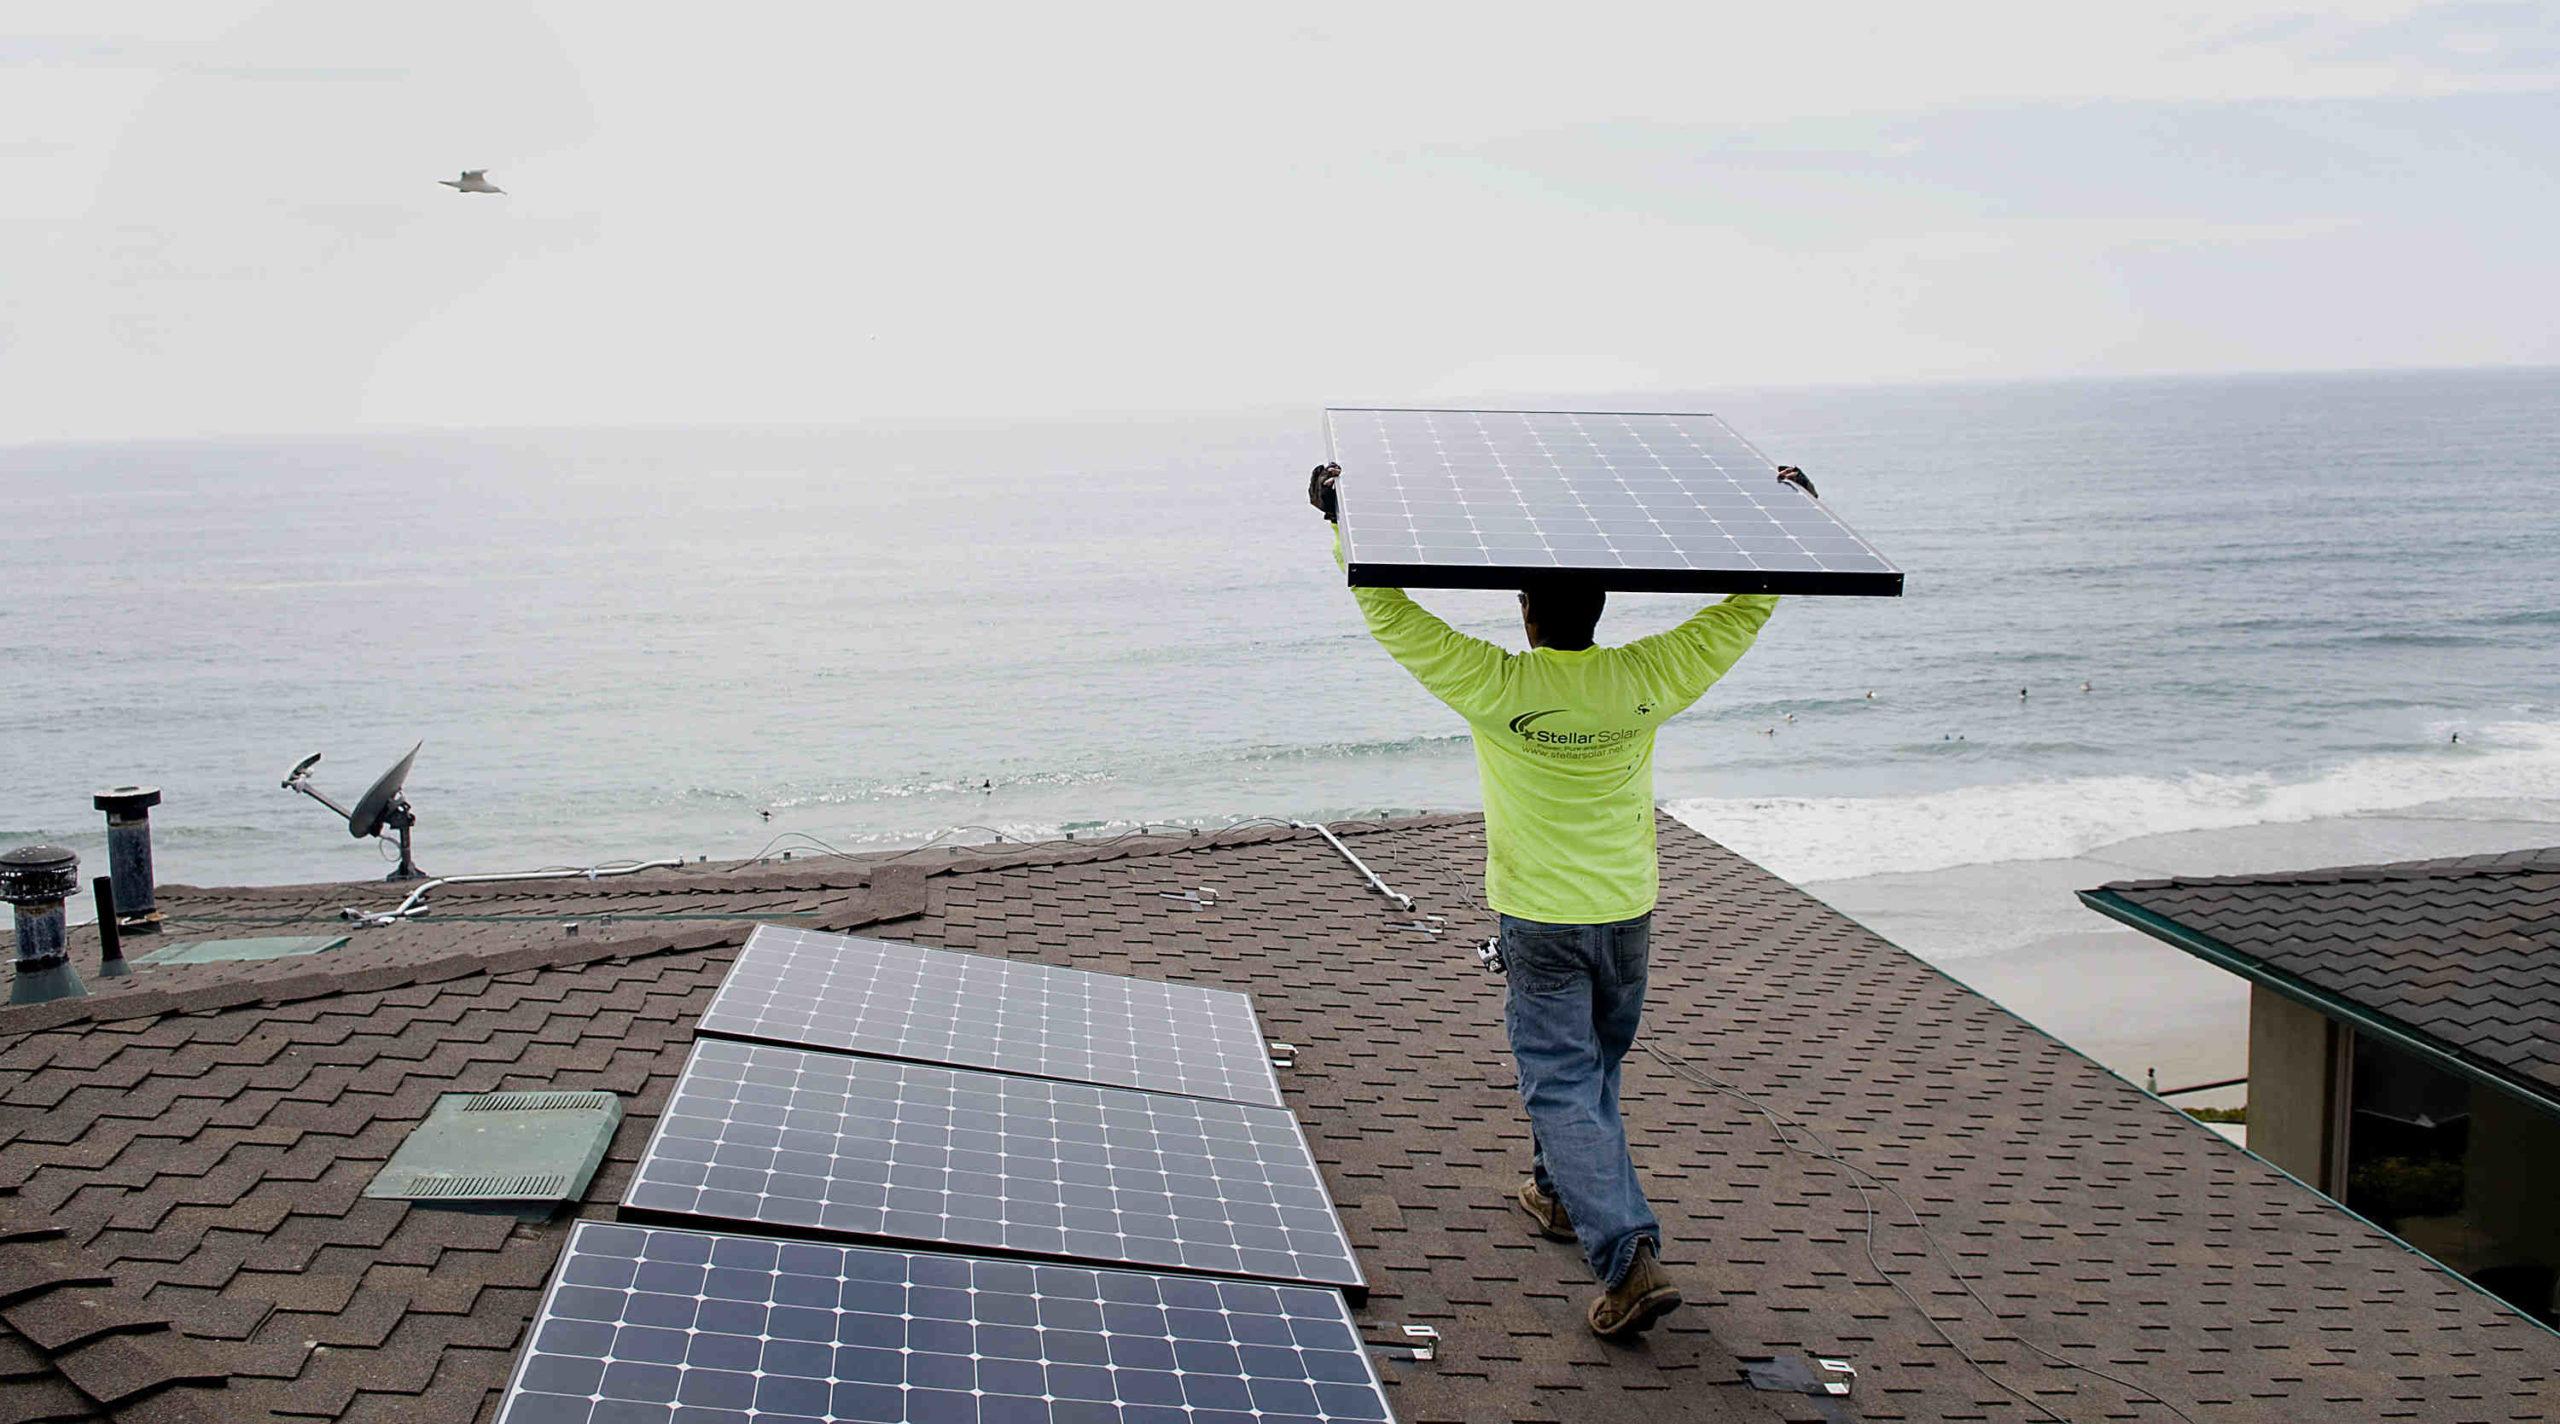 How do I contact solar city?